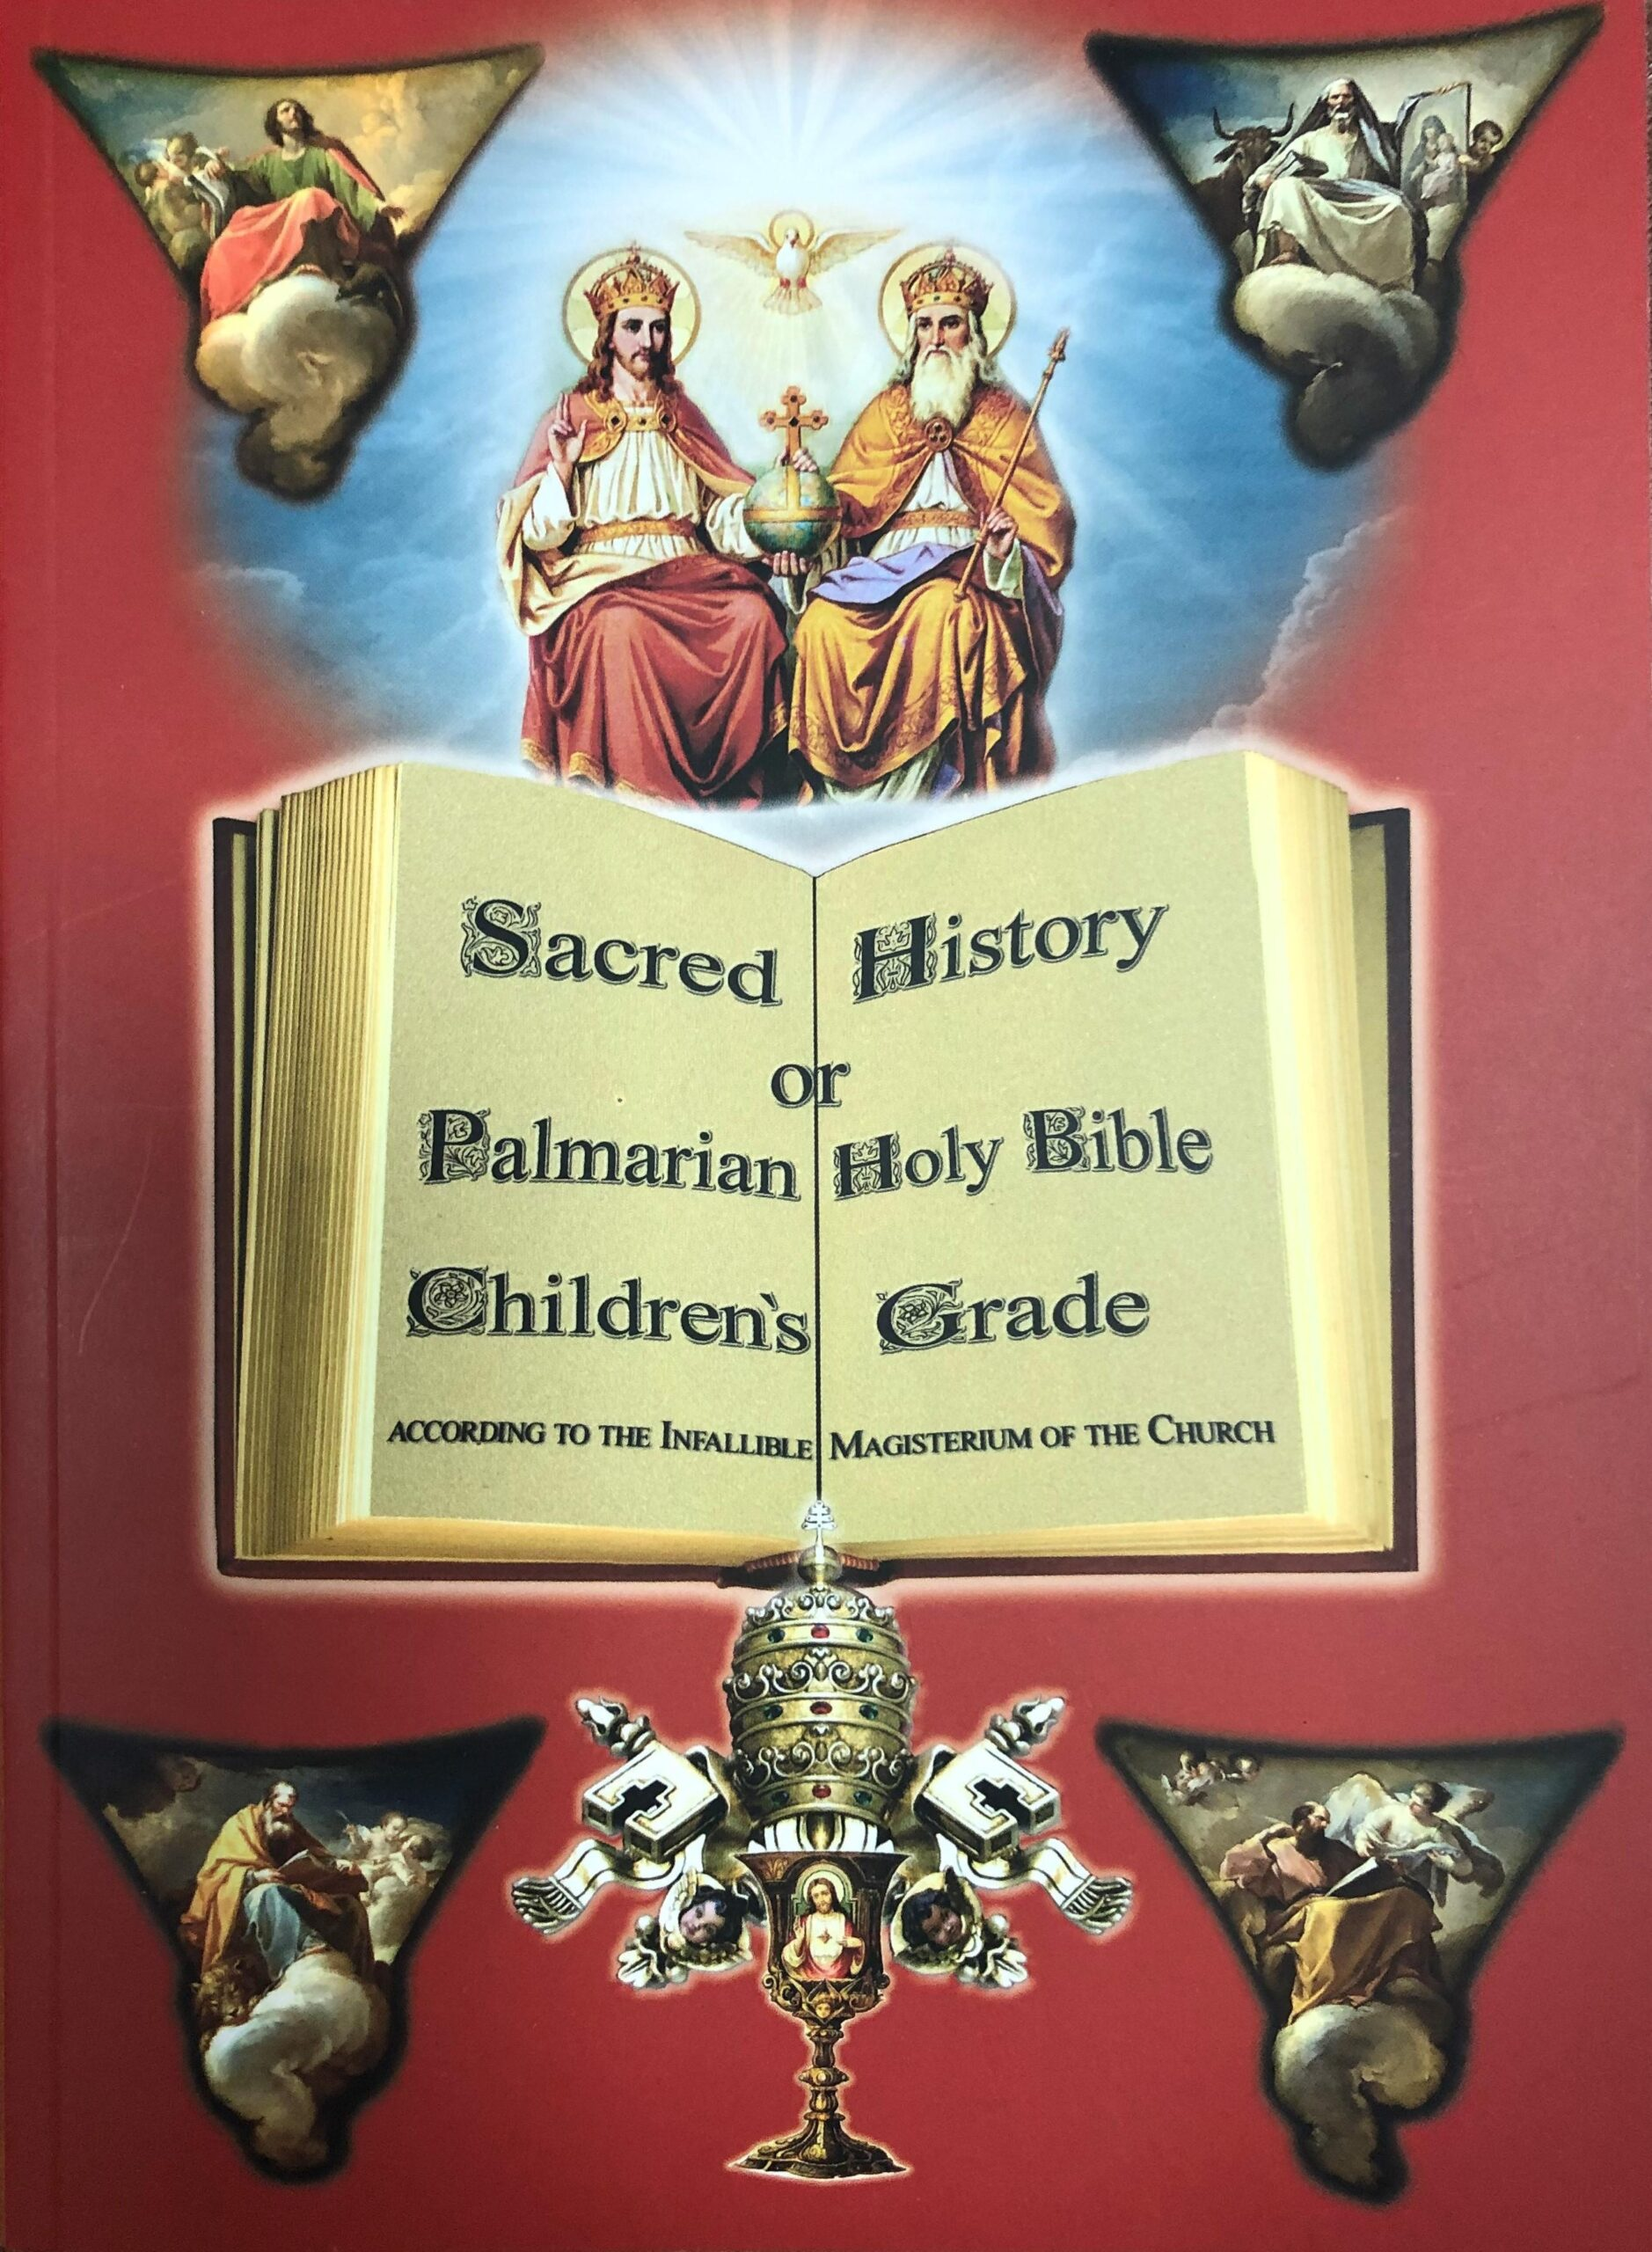 Sacred History or Palmarian Holy Bible Children's Grade<br><br>Vedeți mai departe</a>